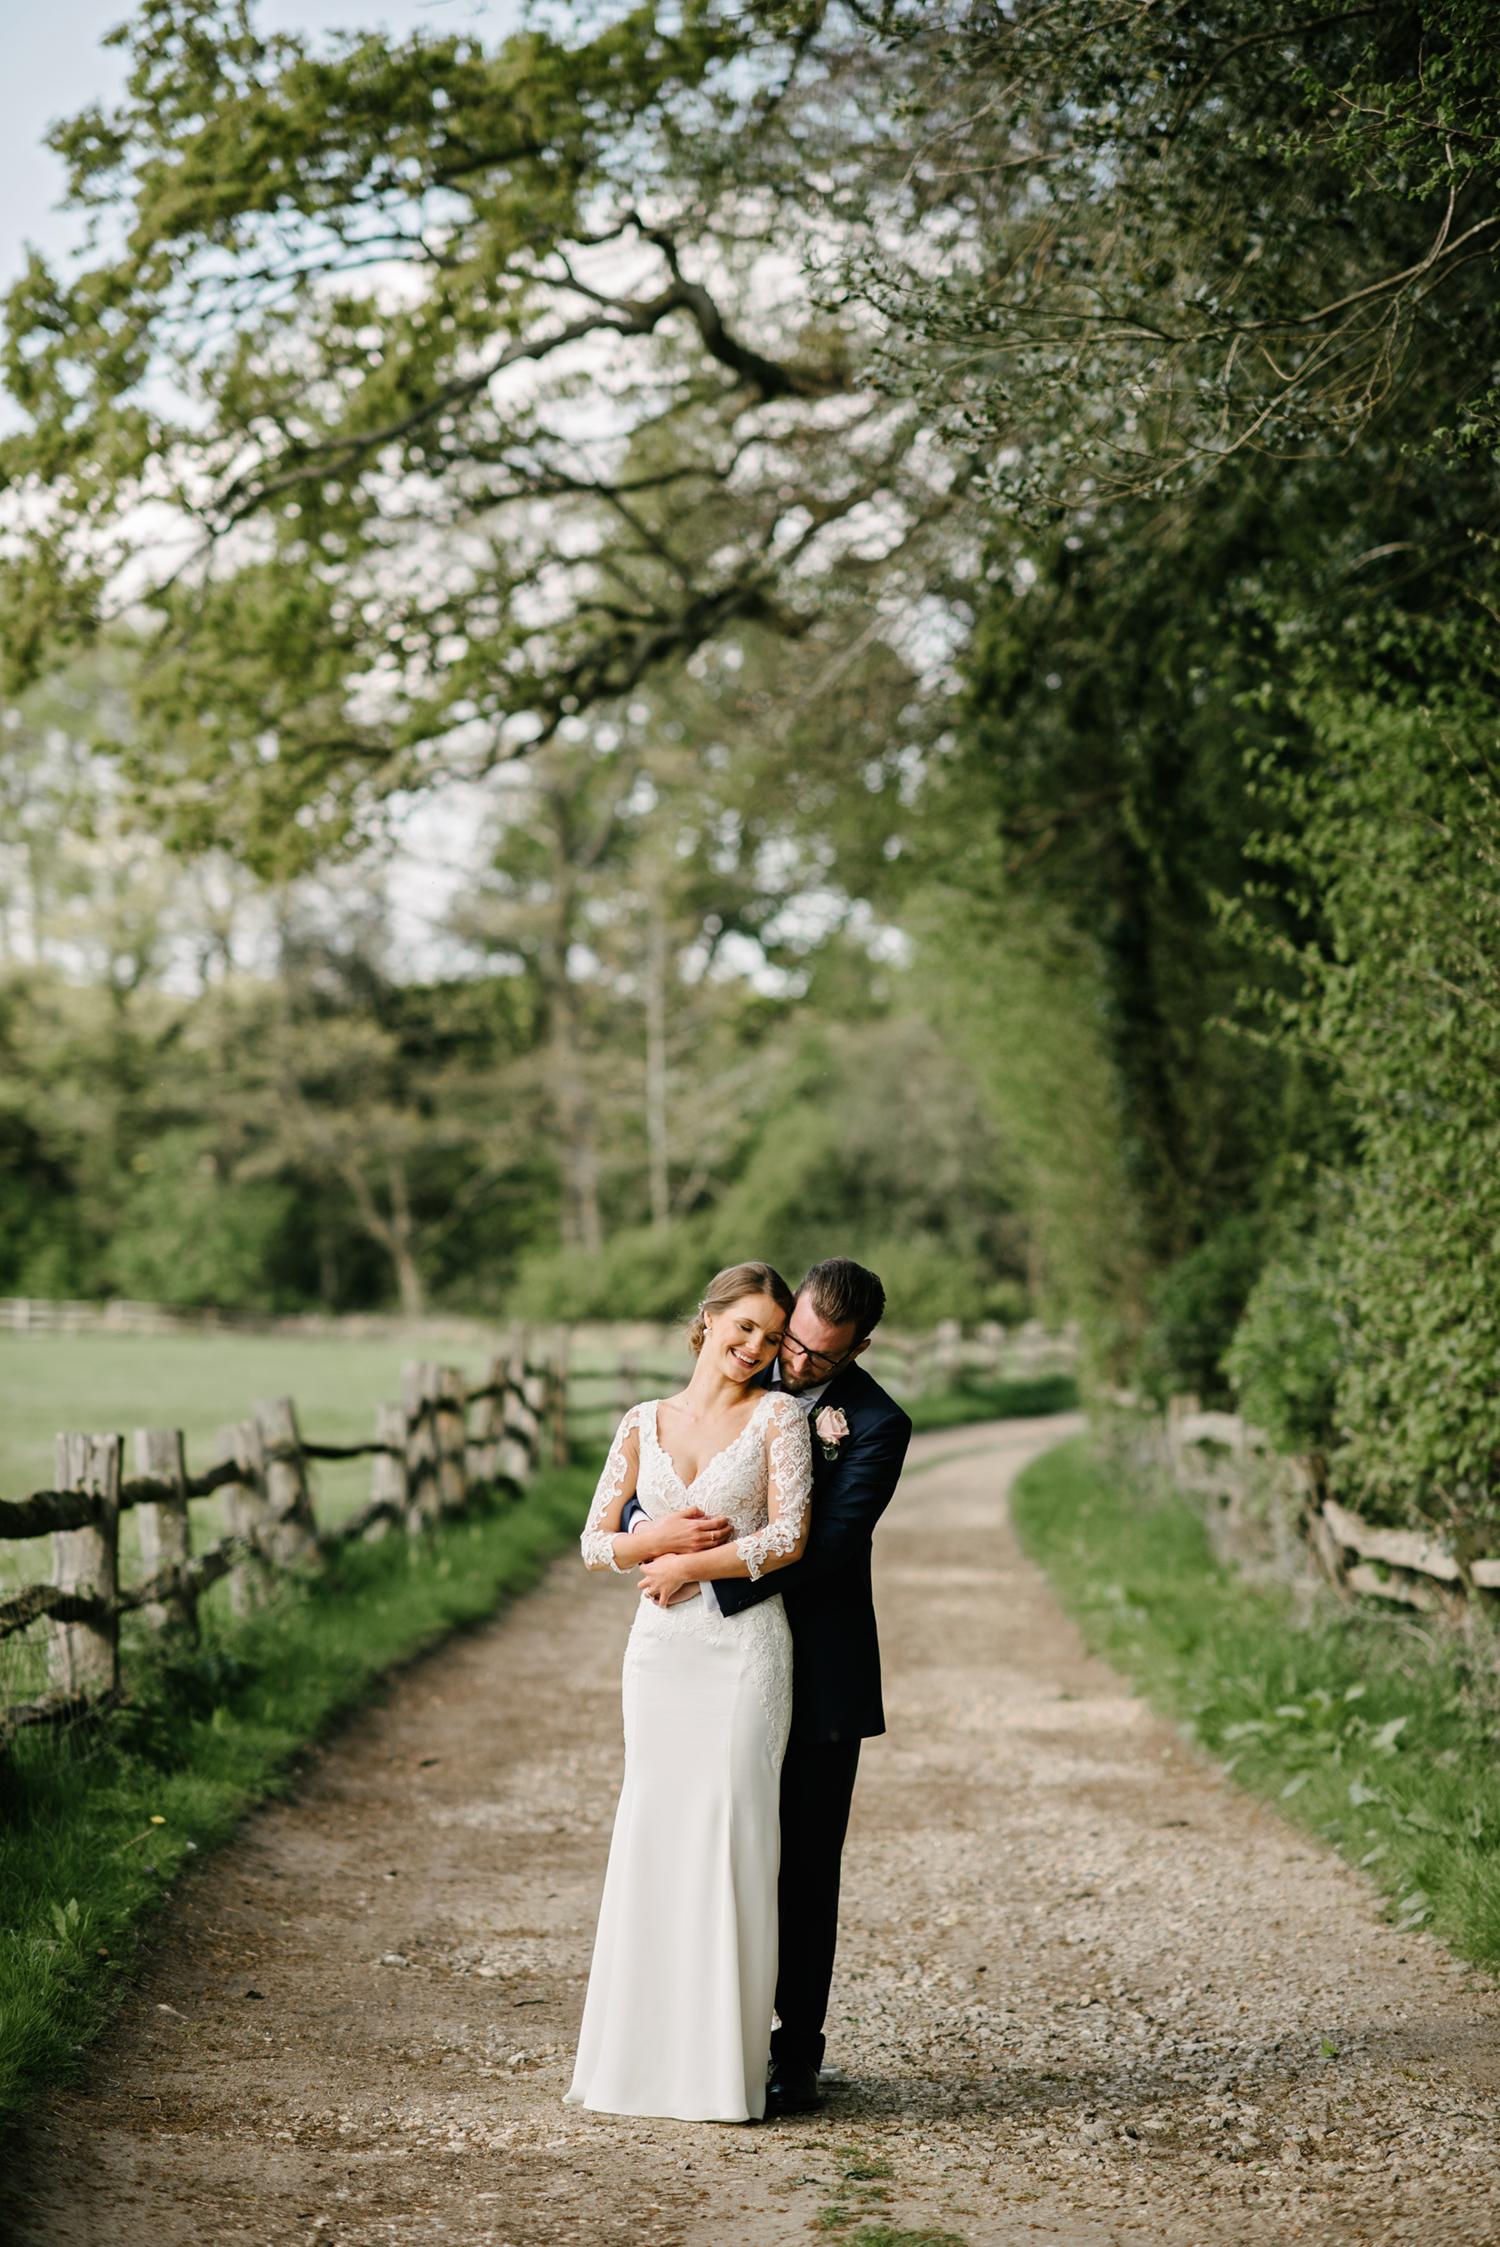 Northbrook-Park-Wedding-Photography-0001.jpg